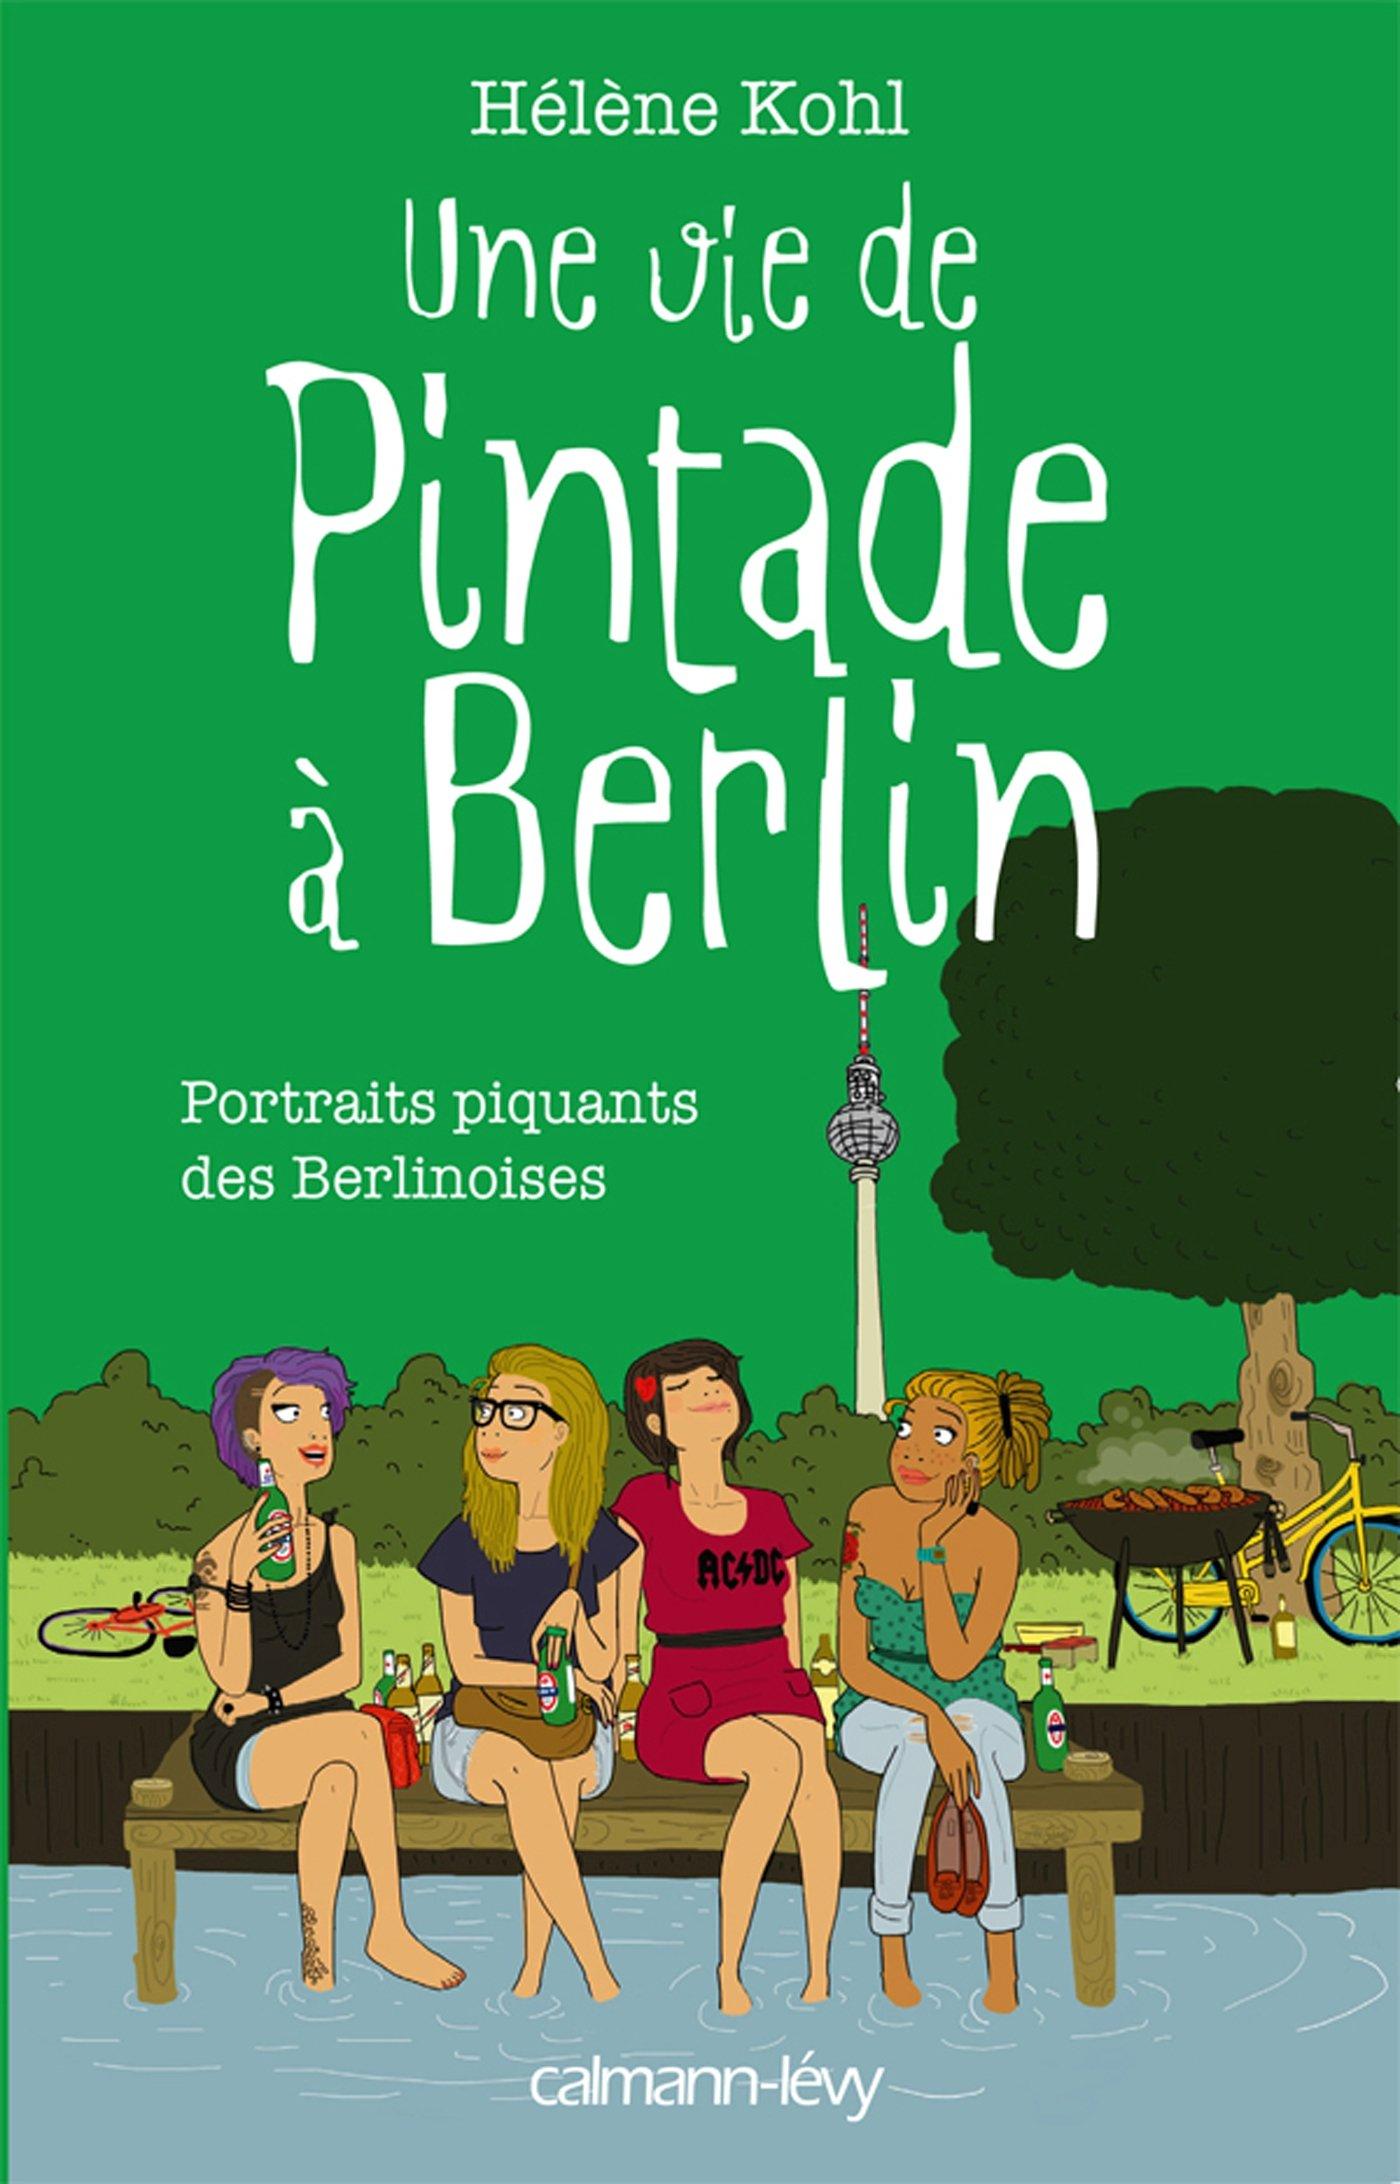 Amazon.fr - Une vie de pintade à Berlin - Hélène Kohl, Sanaa Kassou - Livres